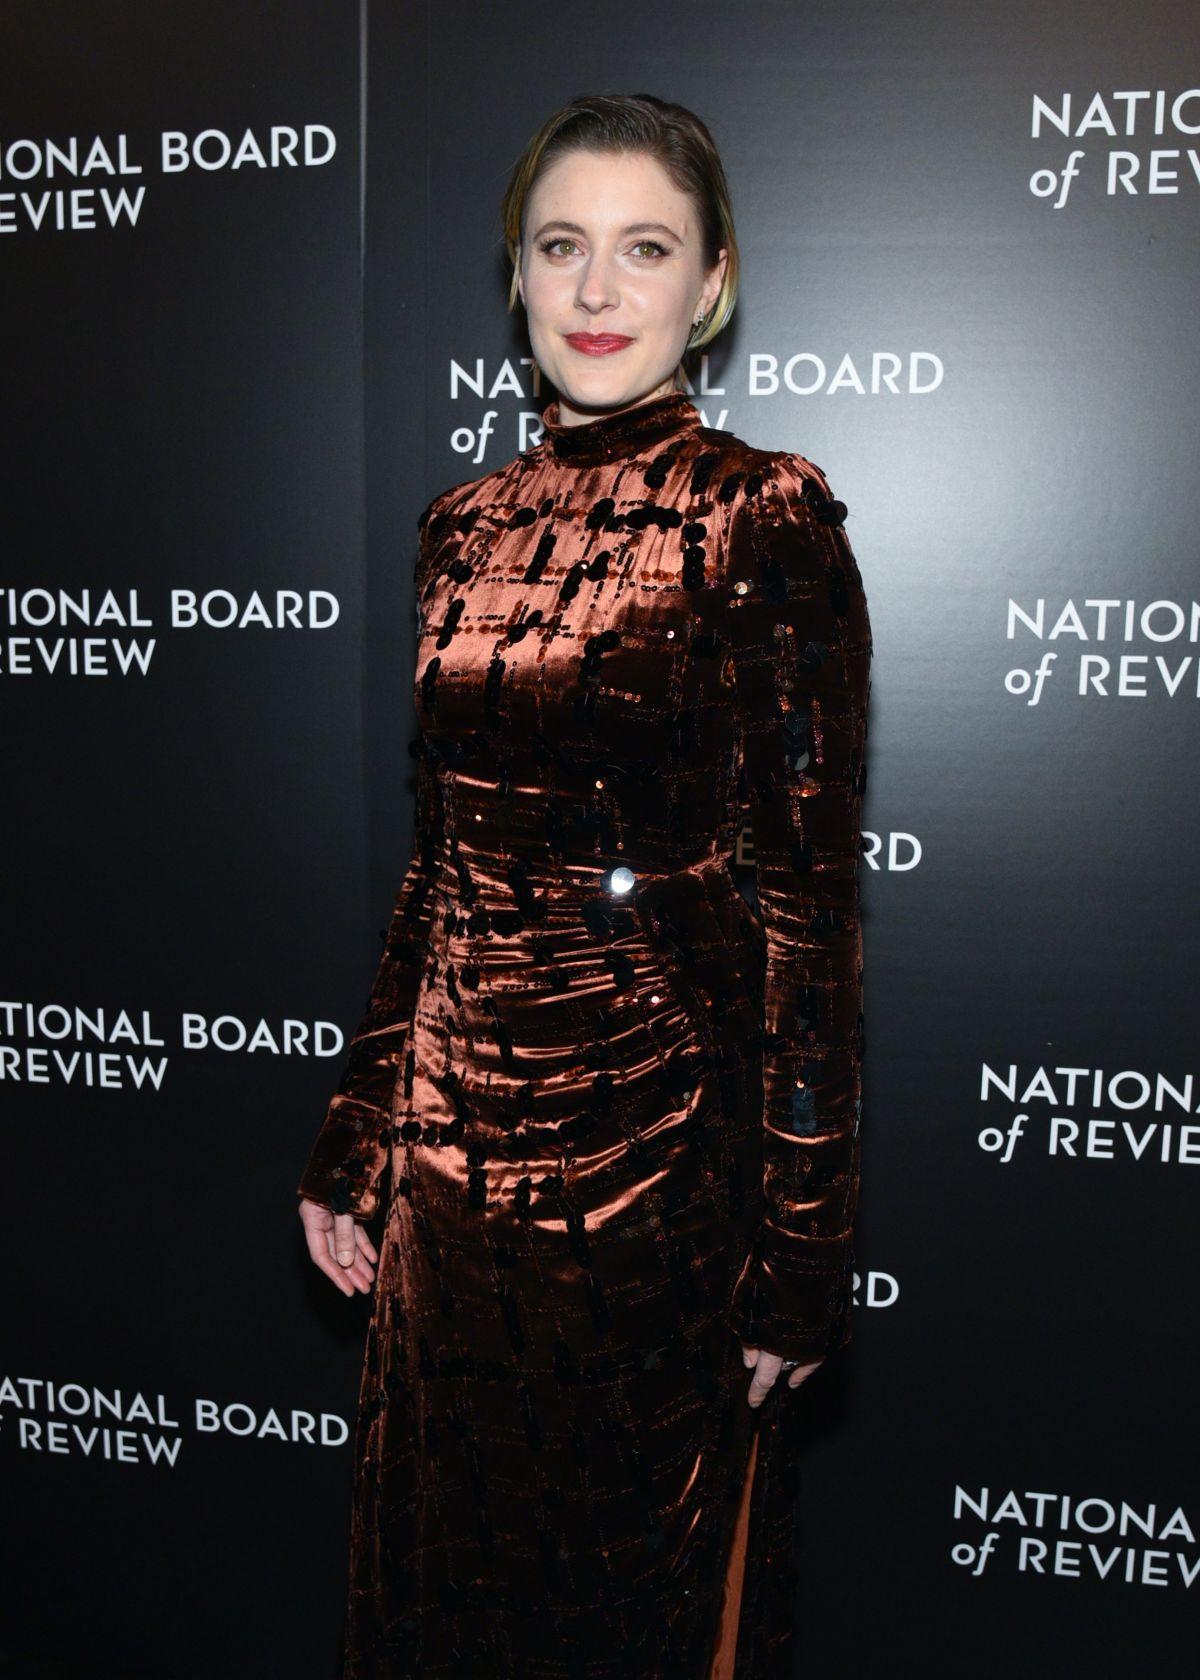 GRETA GERWIG at 2016 National Board of Review Gala in New York 01/04/2017